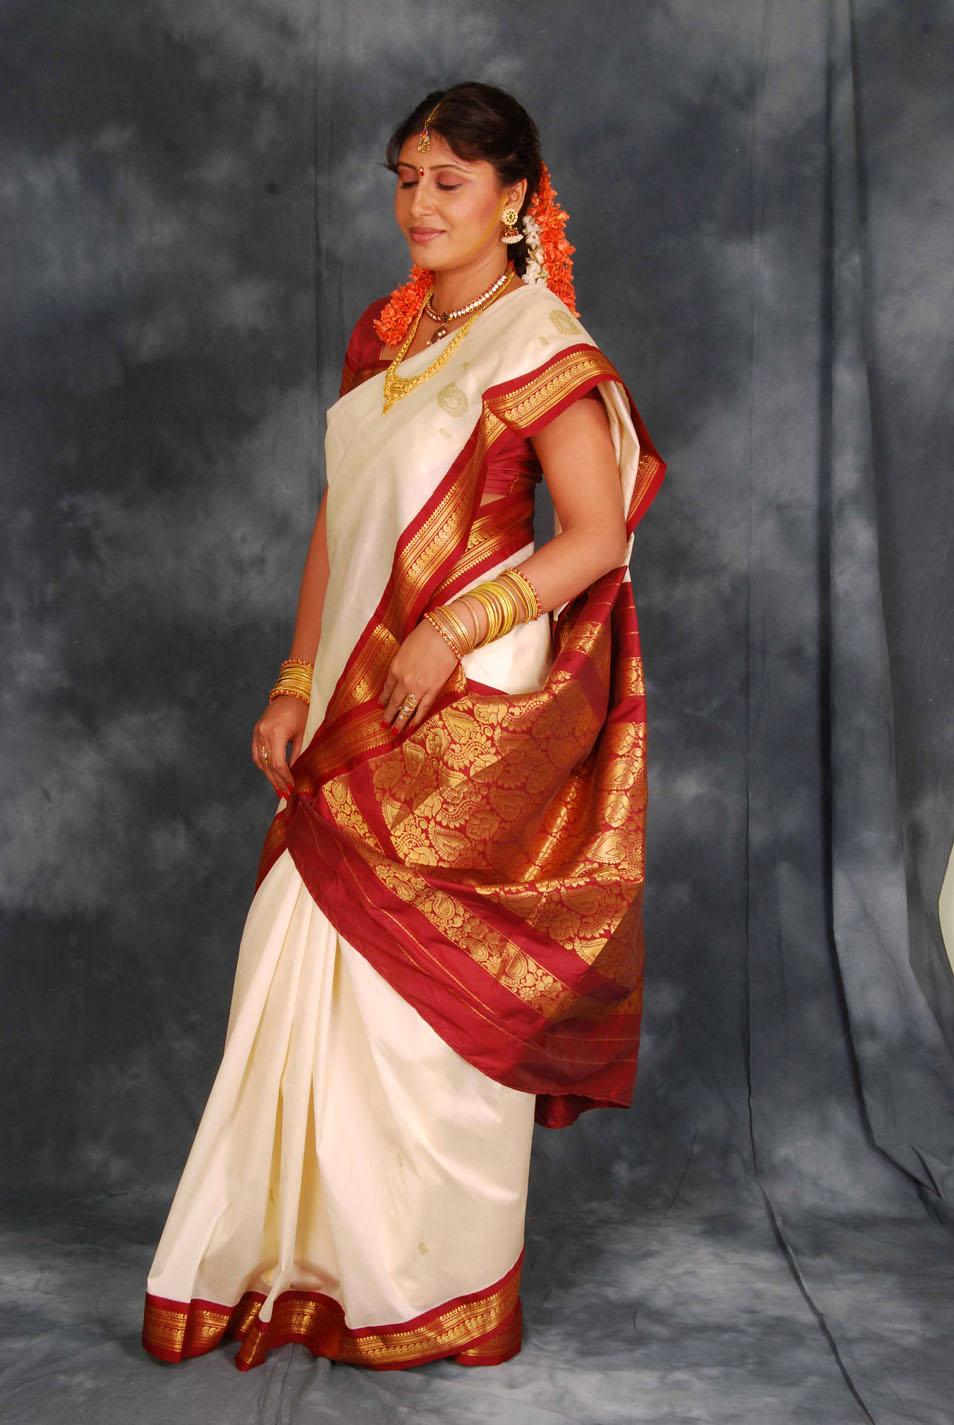 4562a9478e6a43d8ae8d7be7b1270aa1 Tamil Actress Ranjitha Photo Gallery. Tuesday, April 12, 2011